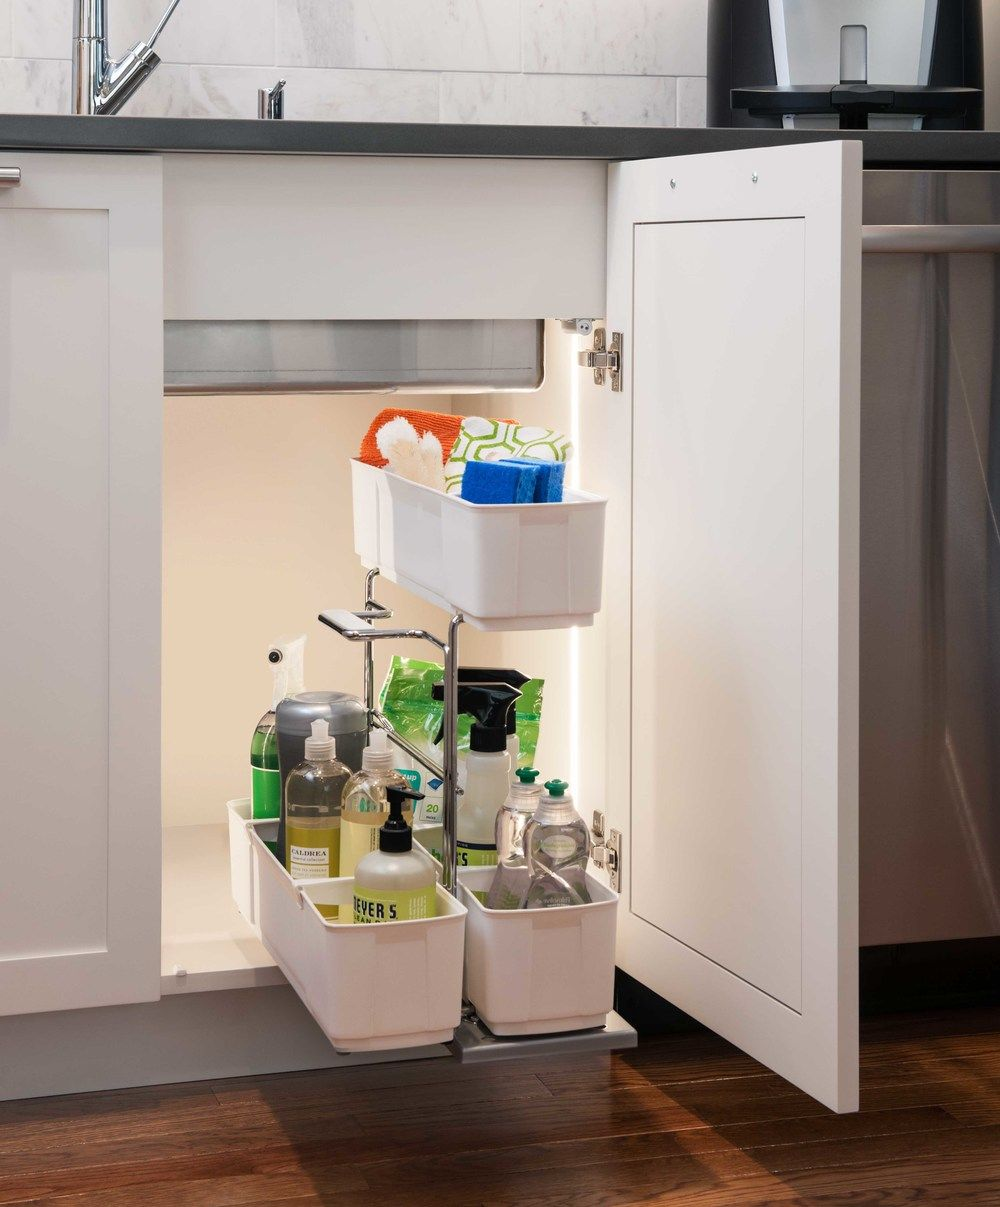 Kessebohmer Kitchen Accessories: The Cleaning AGENT Under Sink Organizer By Kessebohmer